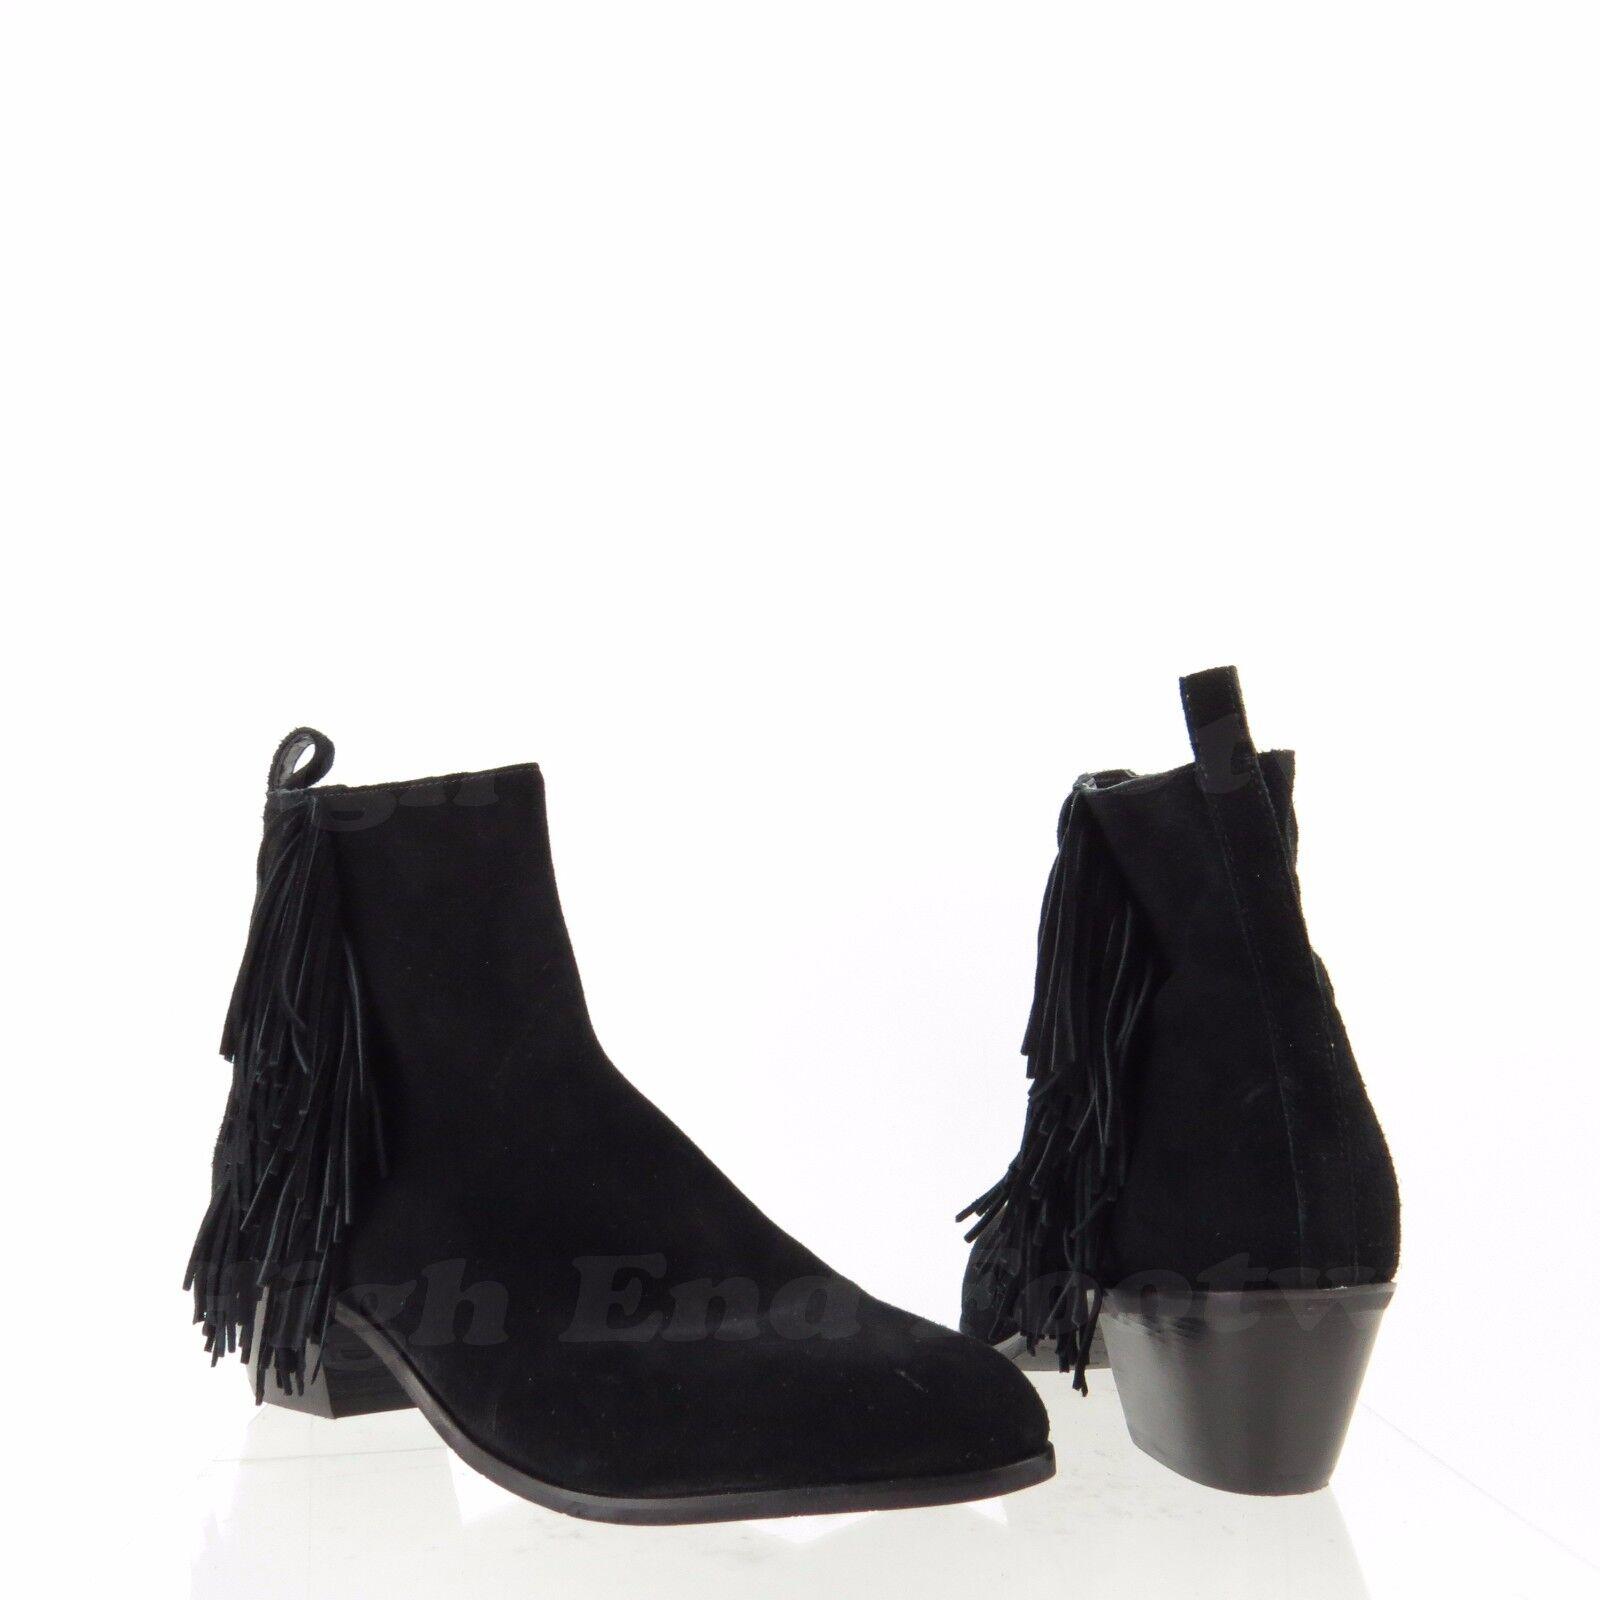 Via Spiga Carey Women's shoes Black Suede Fringe Dress Booties Sz 8 M NEW  325